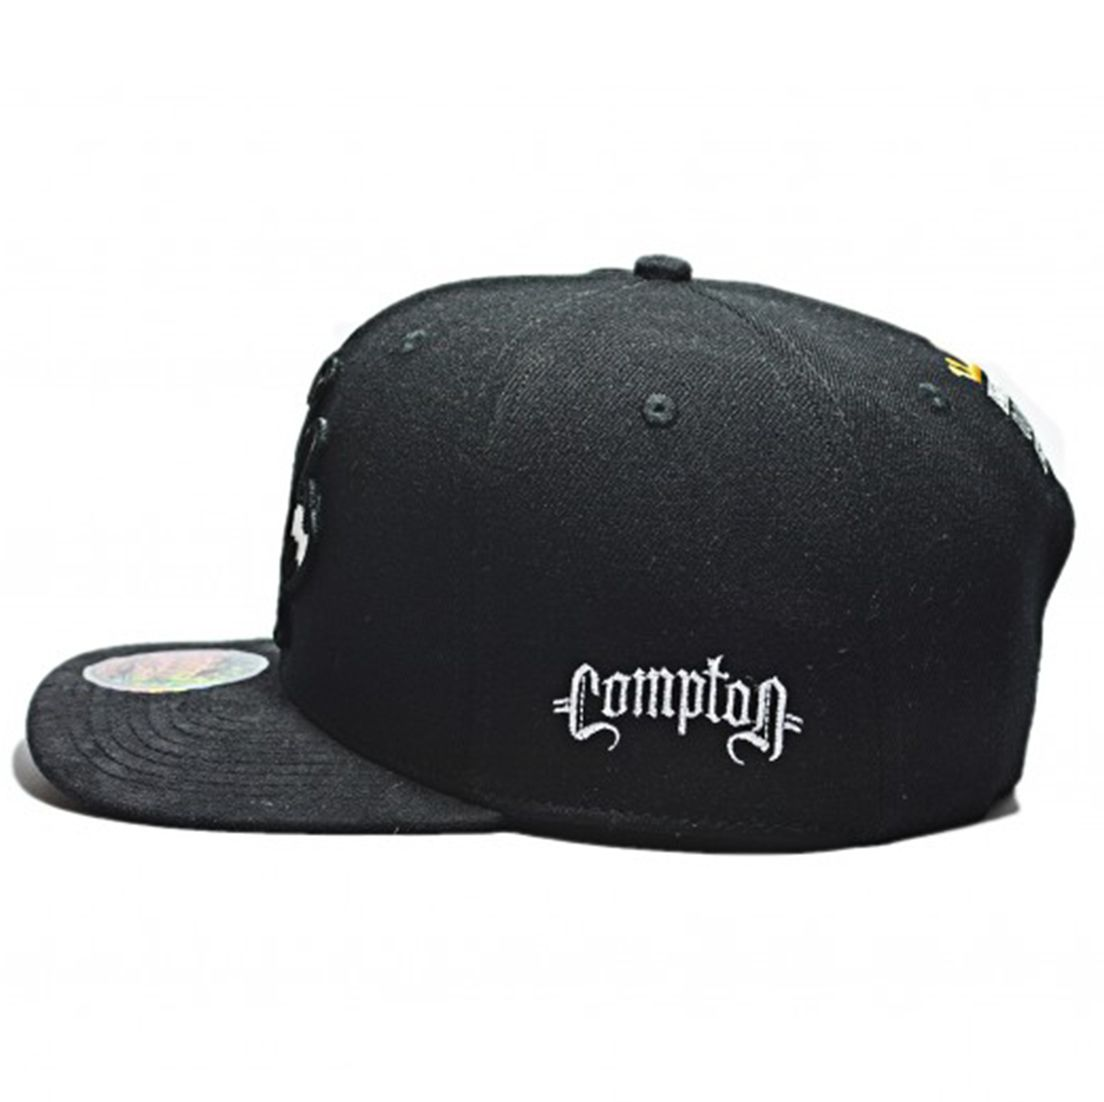 Boné Aba Reta Snapback Nwa Hands Up Preto Compton